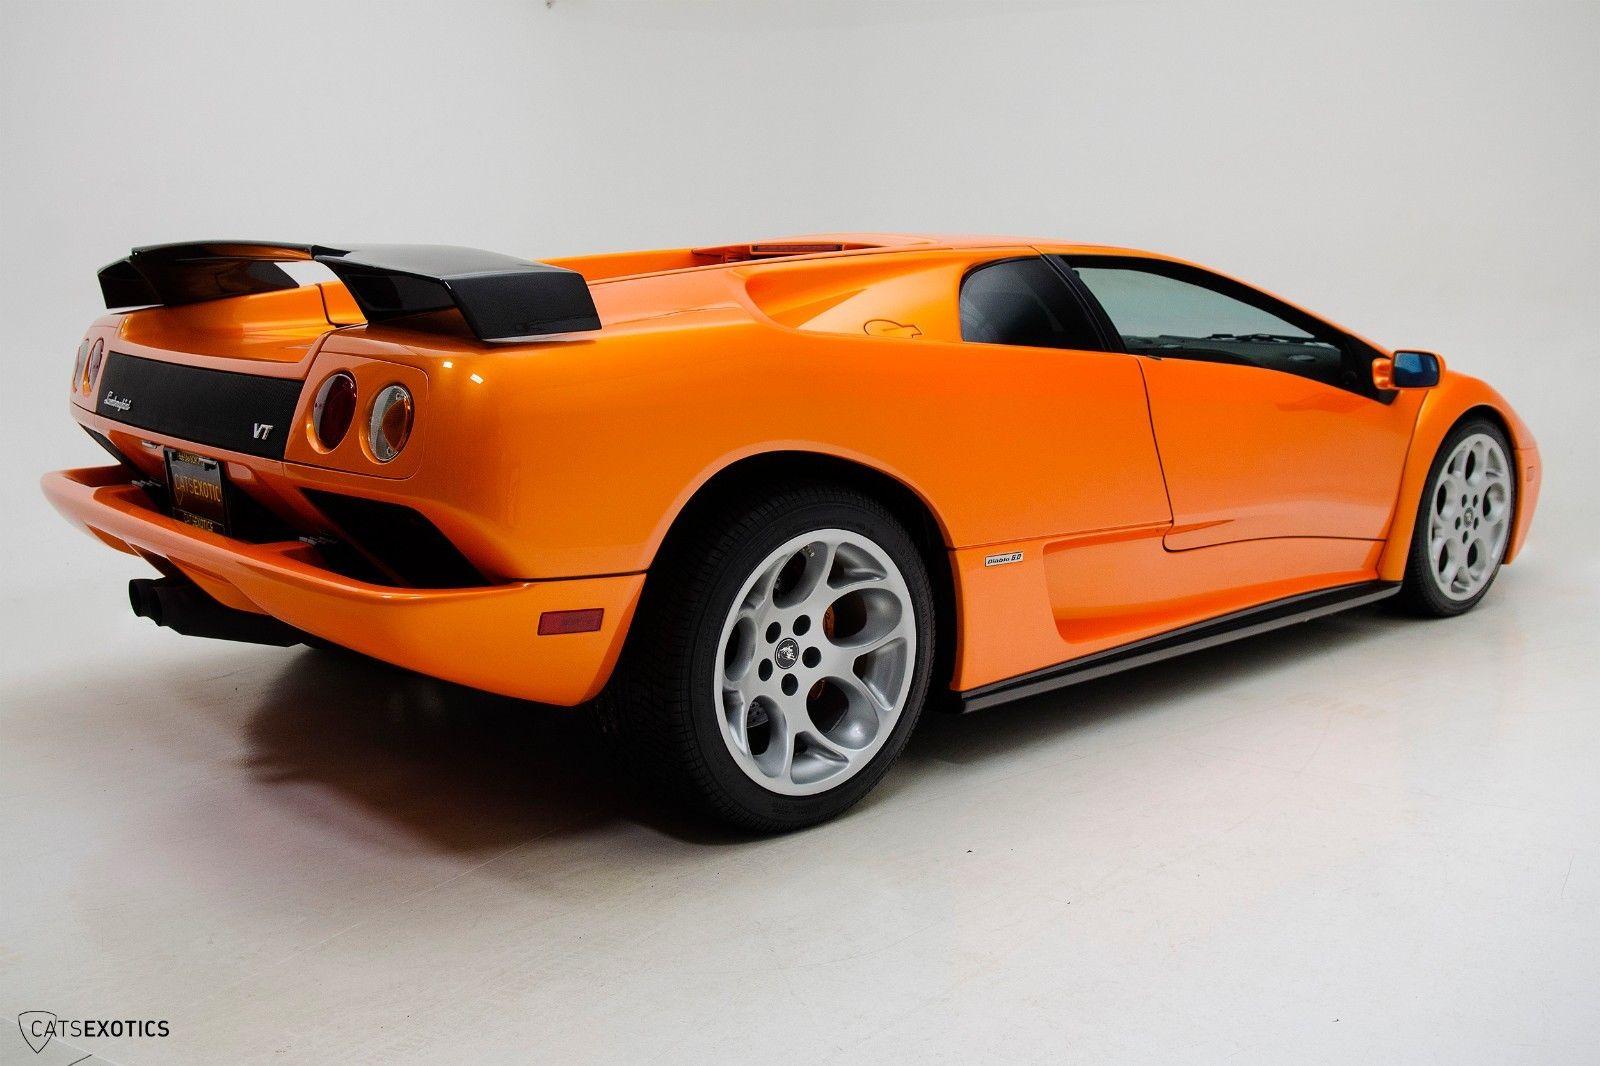 Awesome 2001 Lamborghini Diablo 6 0 Vt Rare Arancio Atlas Carbon